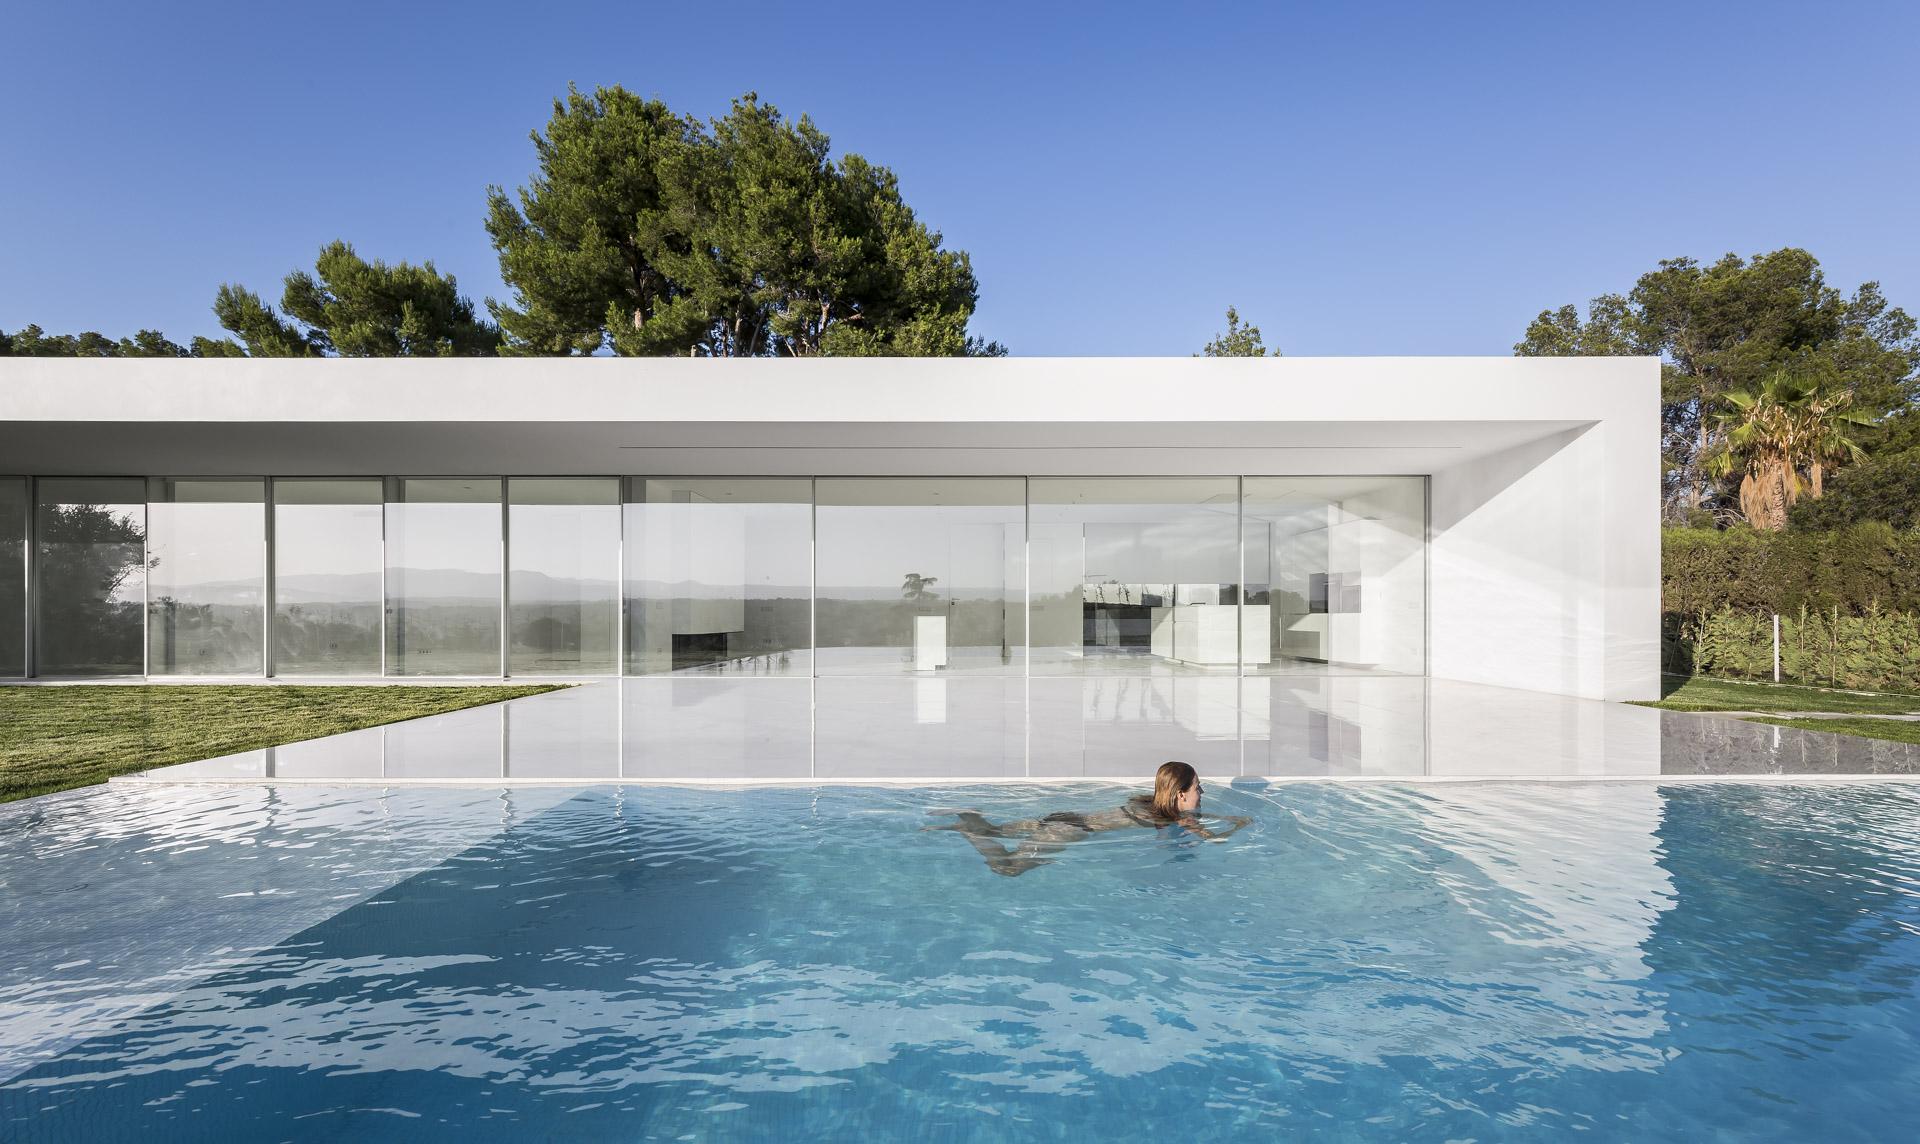 fotografia-arquitectura-valencia-german-cabo-gallardo-llopis-villamarchante-vivienda-45